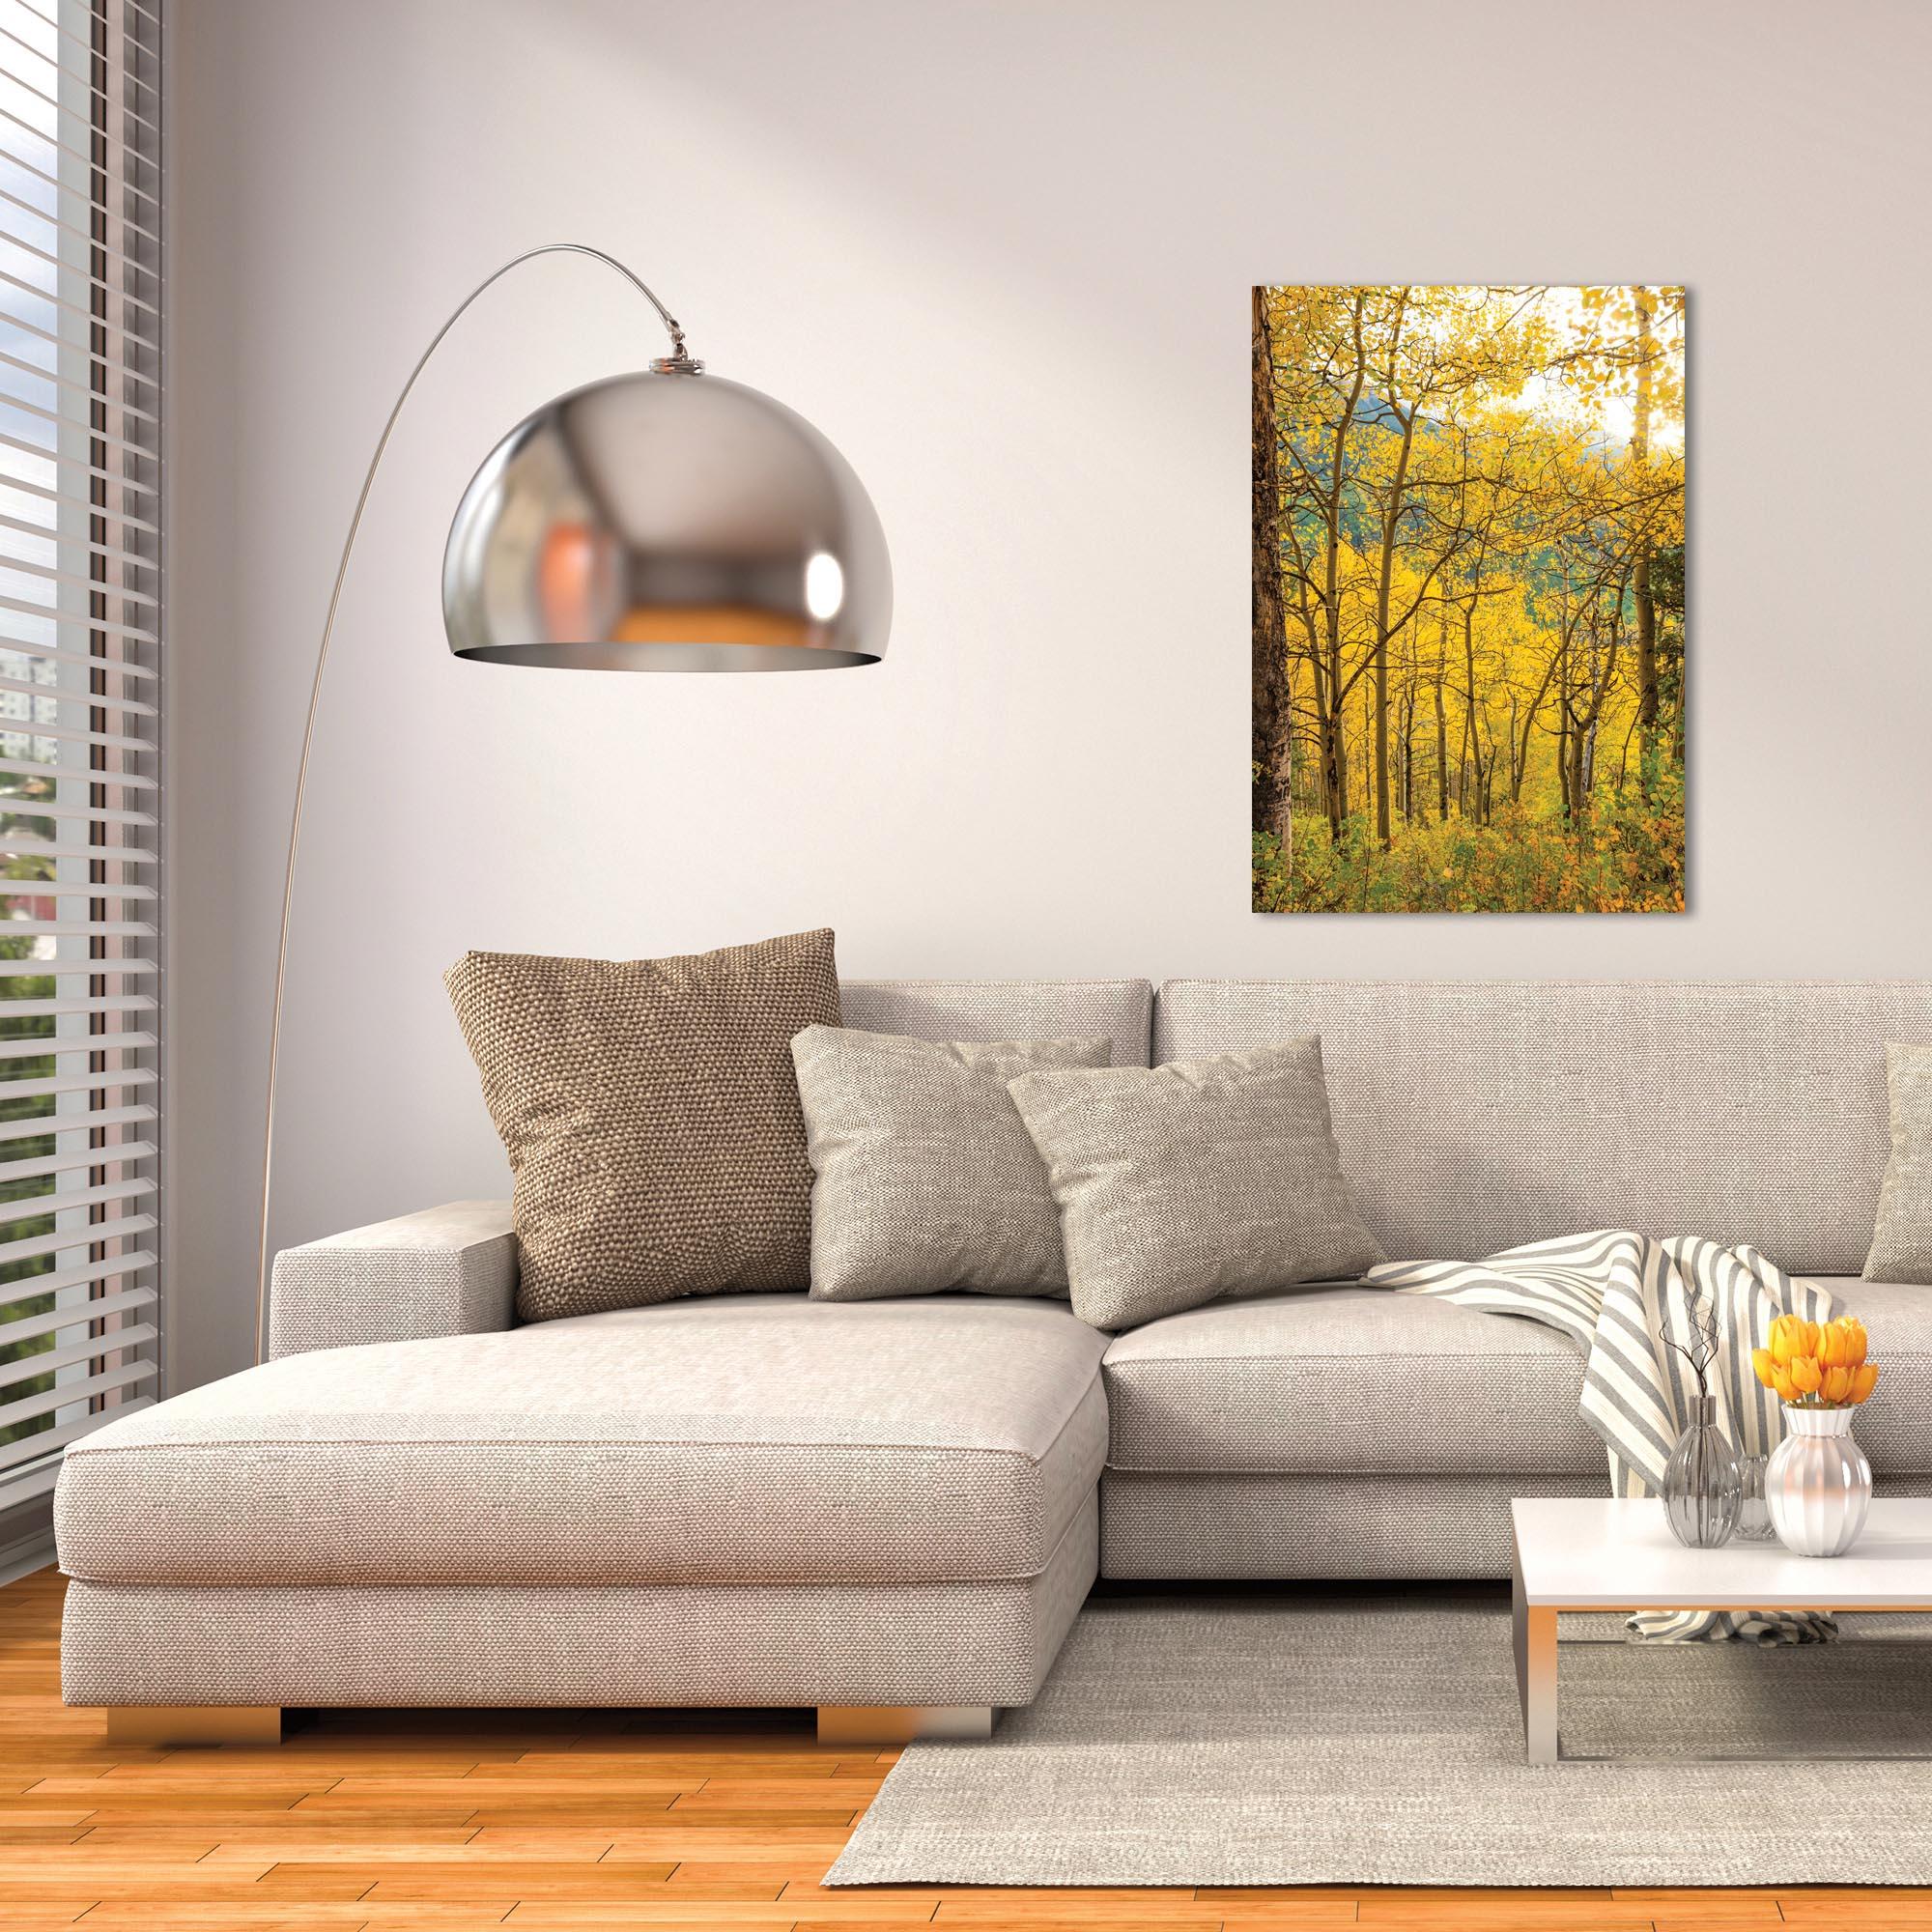 Landscape Photography 'Aspen Path' - Autumn Nature Art on Metal or Plexiglass - Lifestyle View